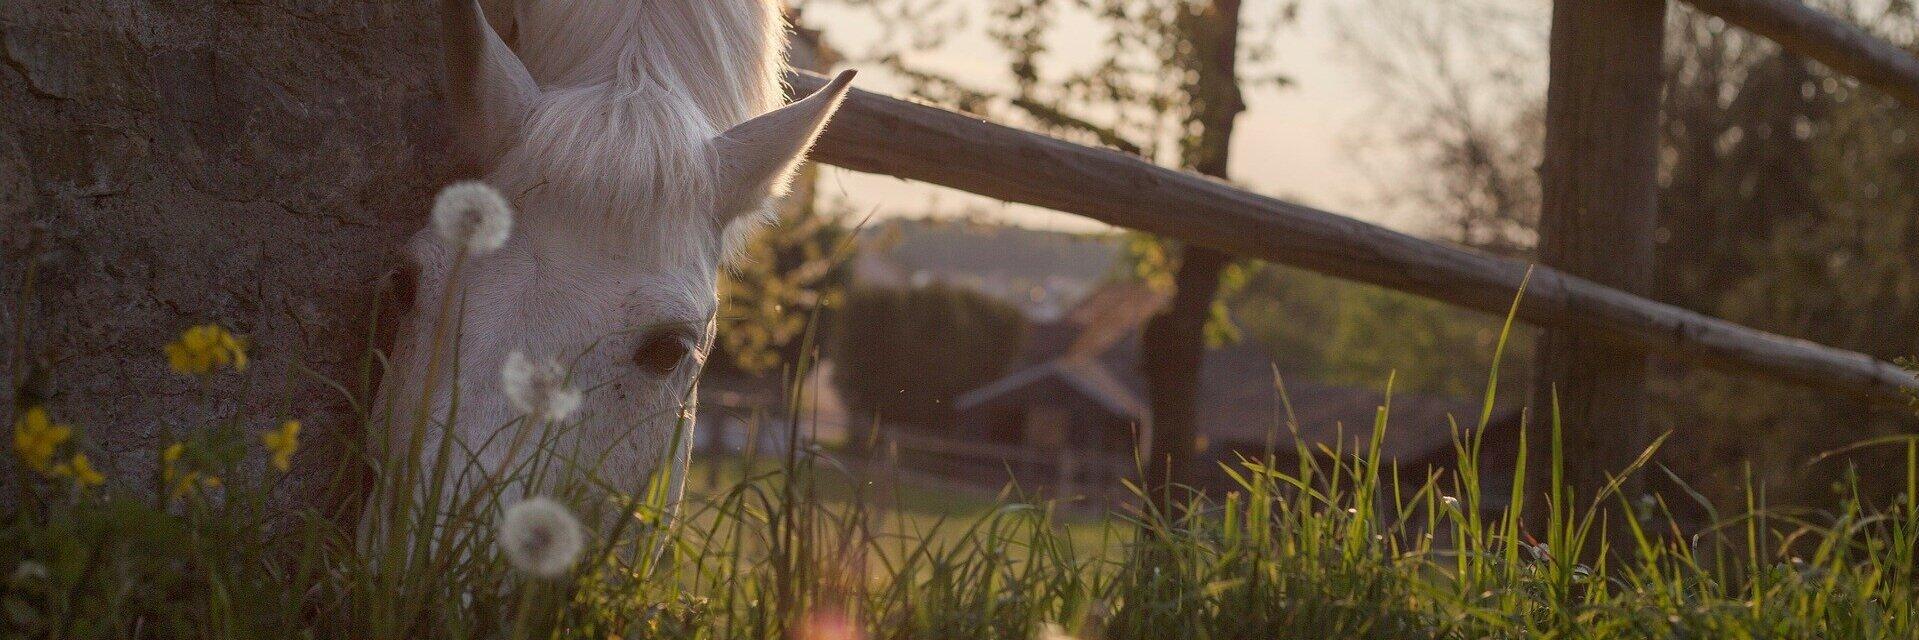 horse-331866_1920.jpg